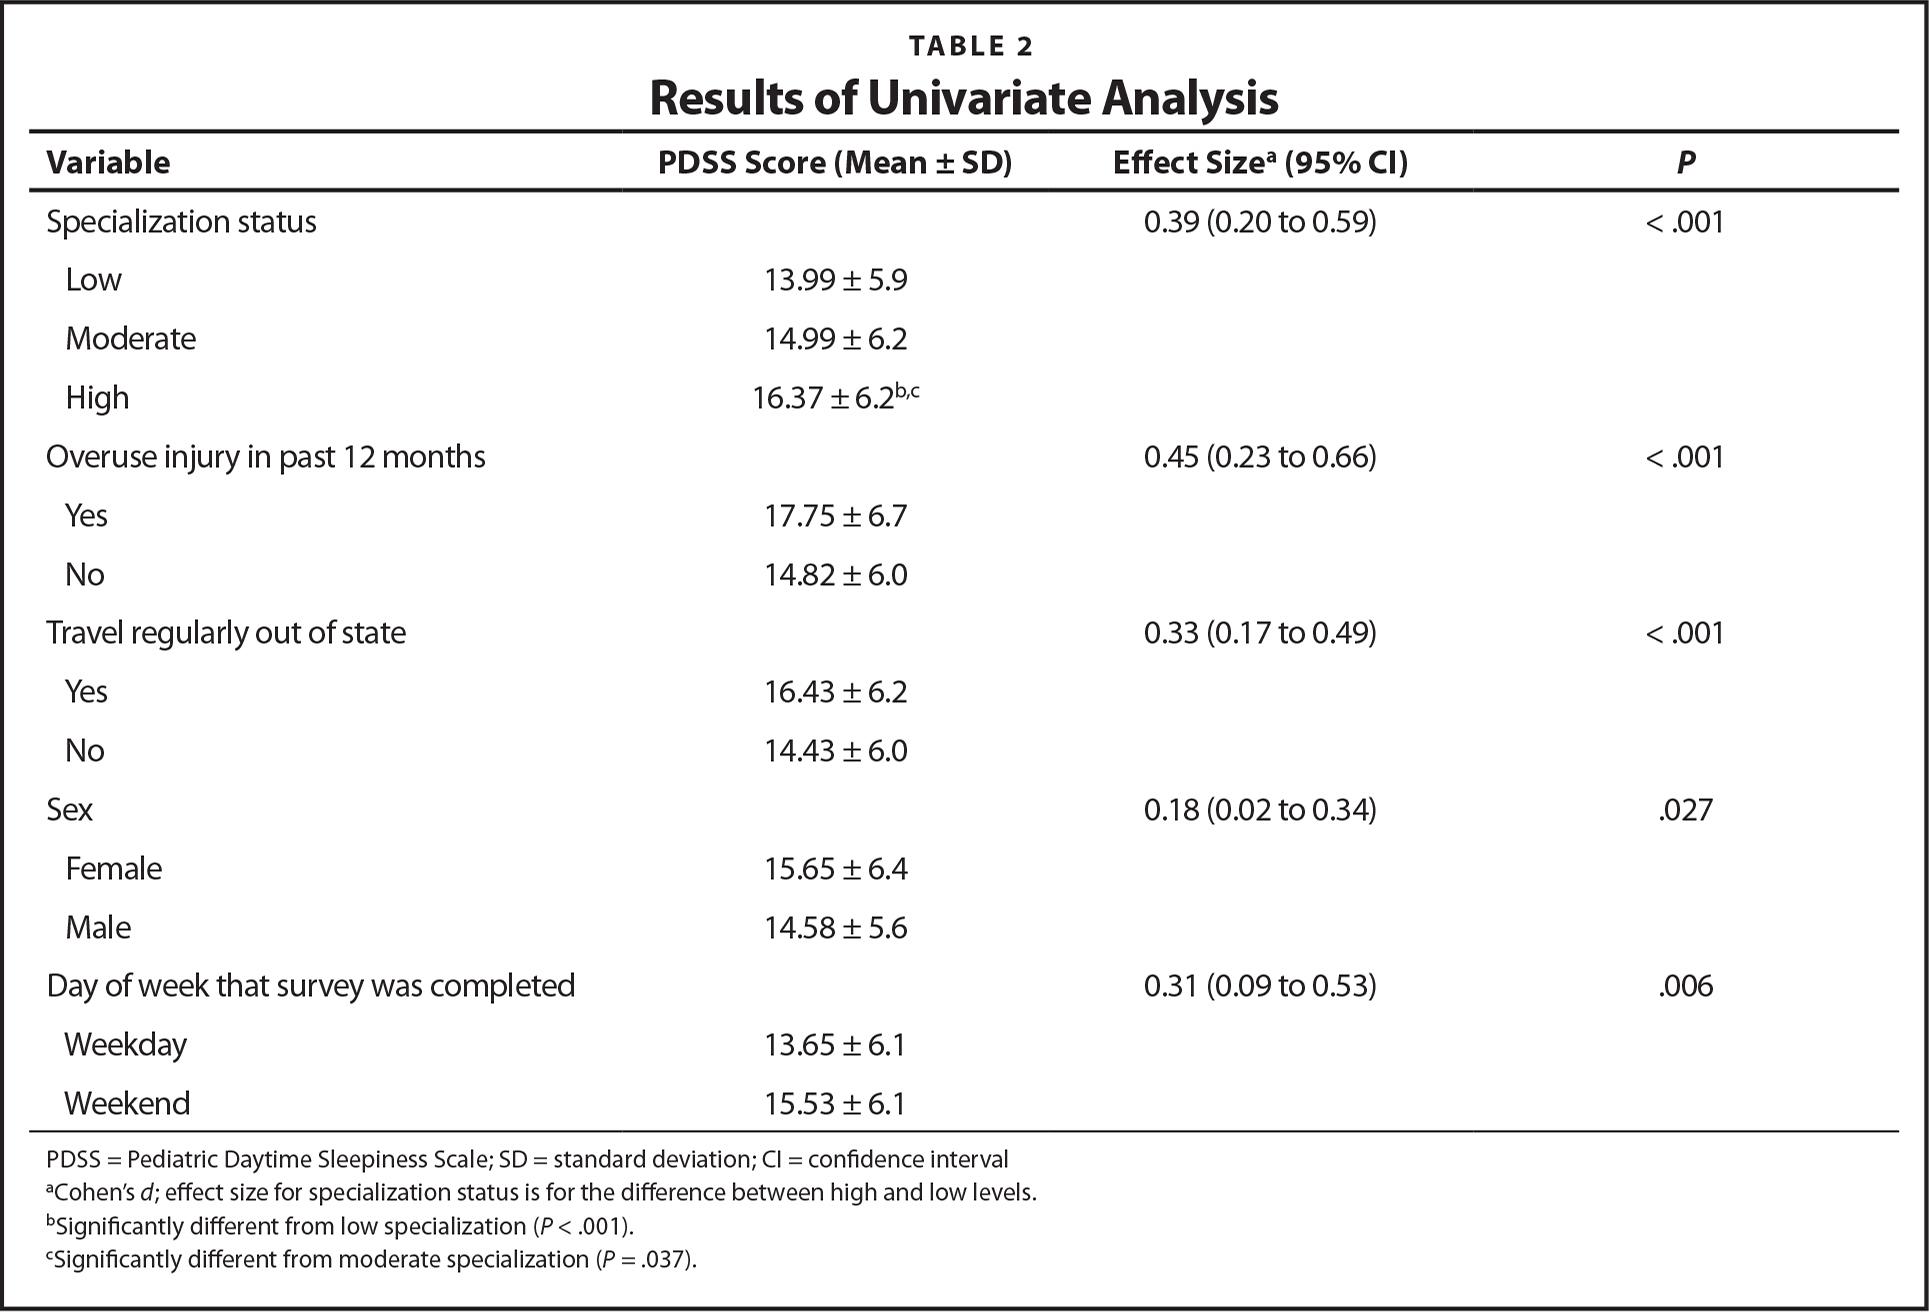 Results of Univariate Analysis